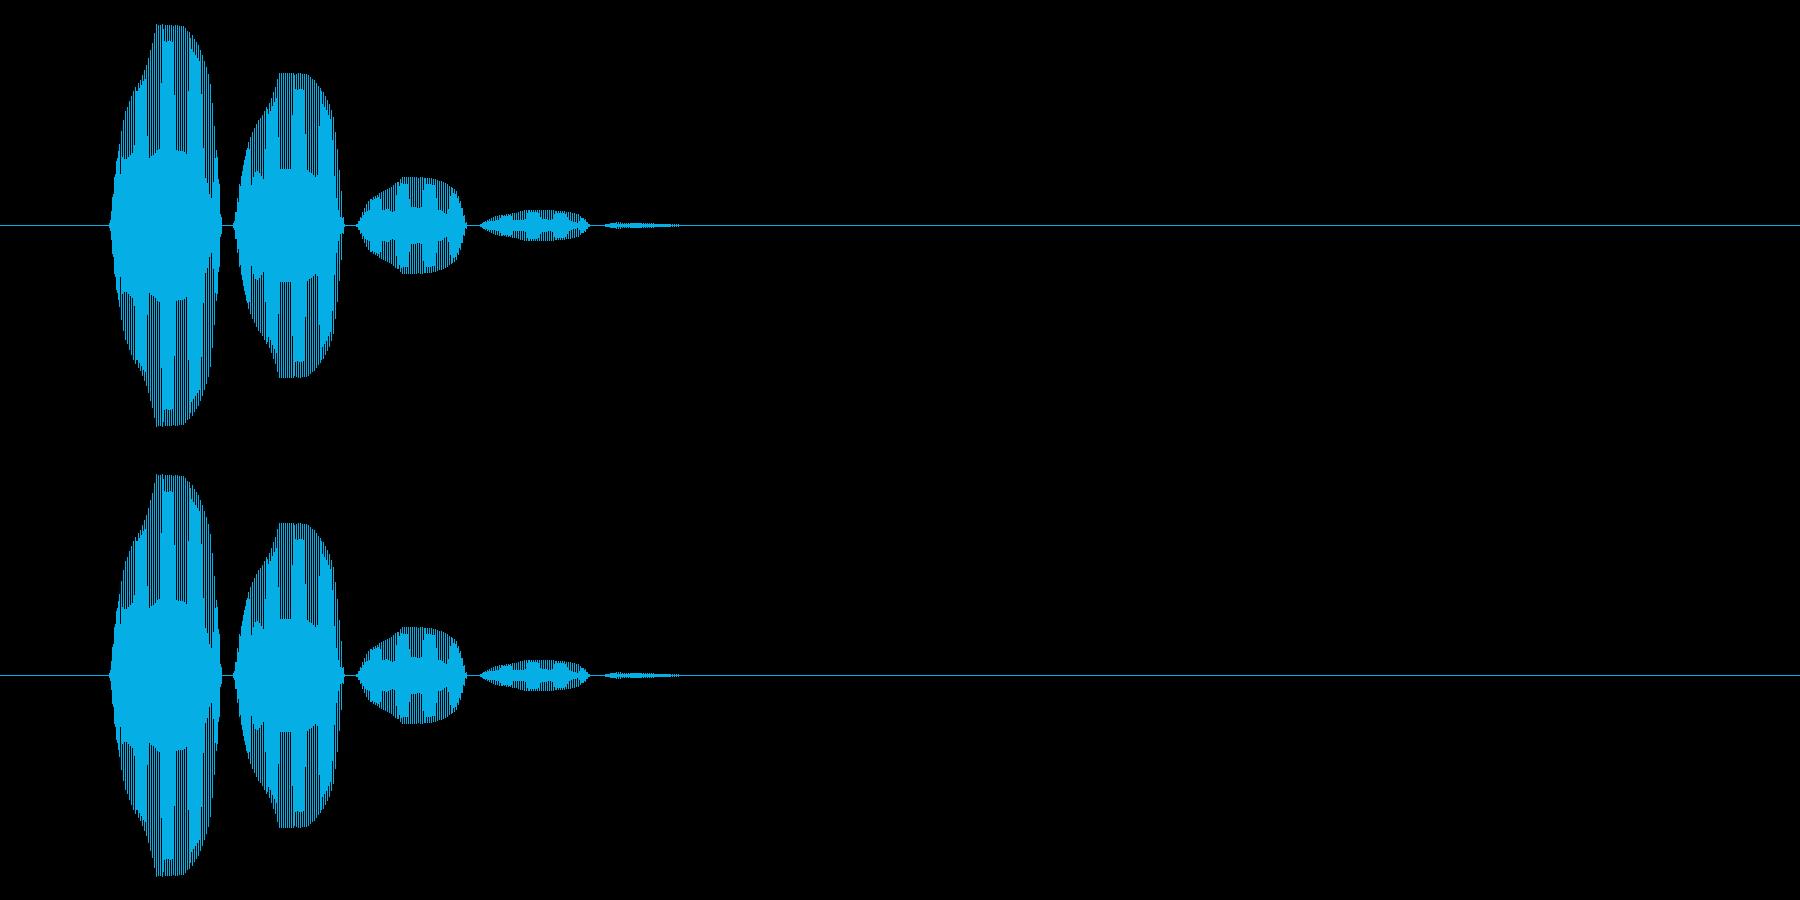 SNES 格闘05-10(選択)の再生済みの波形